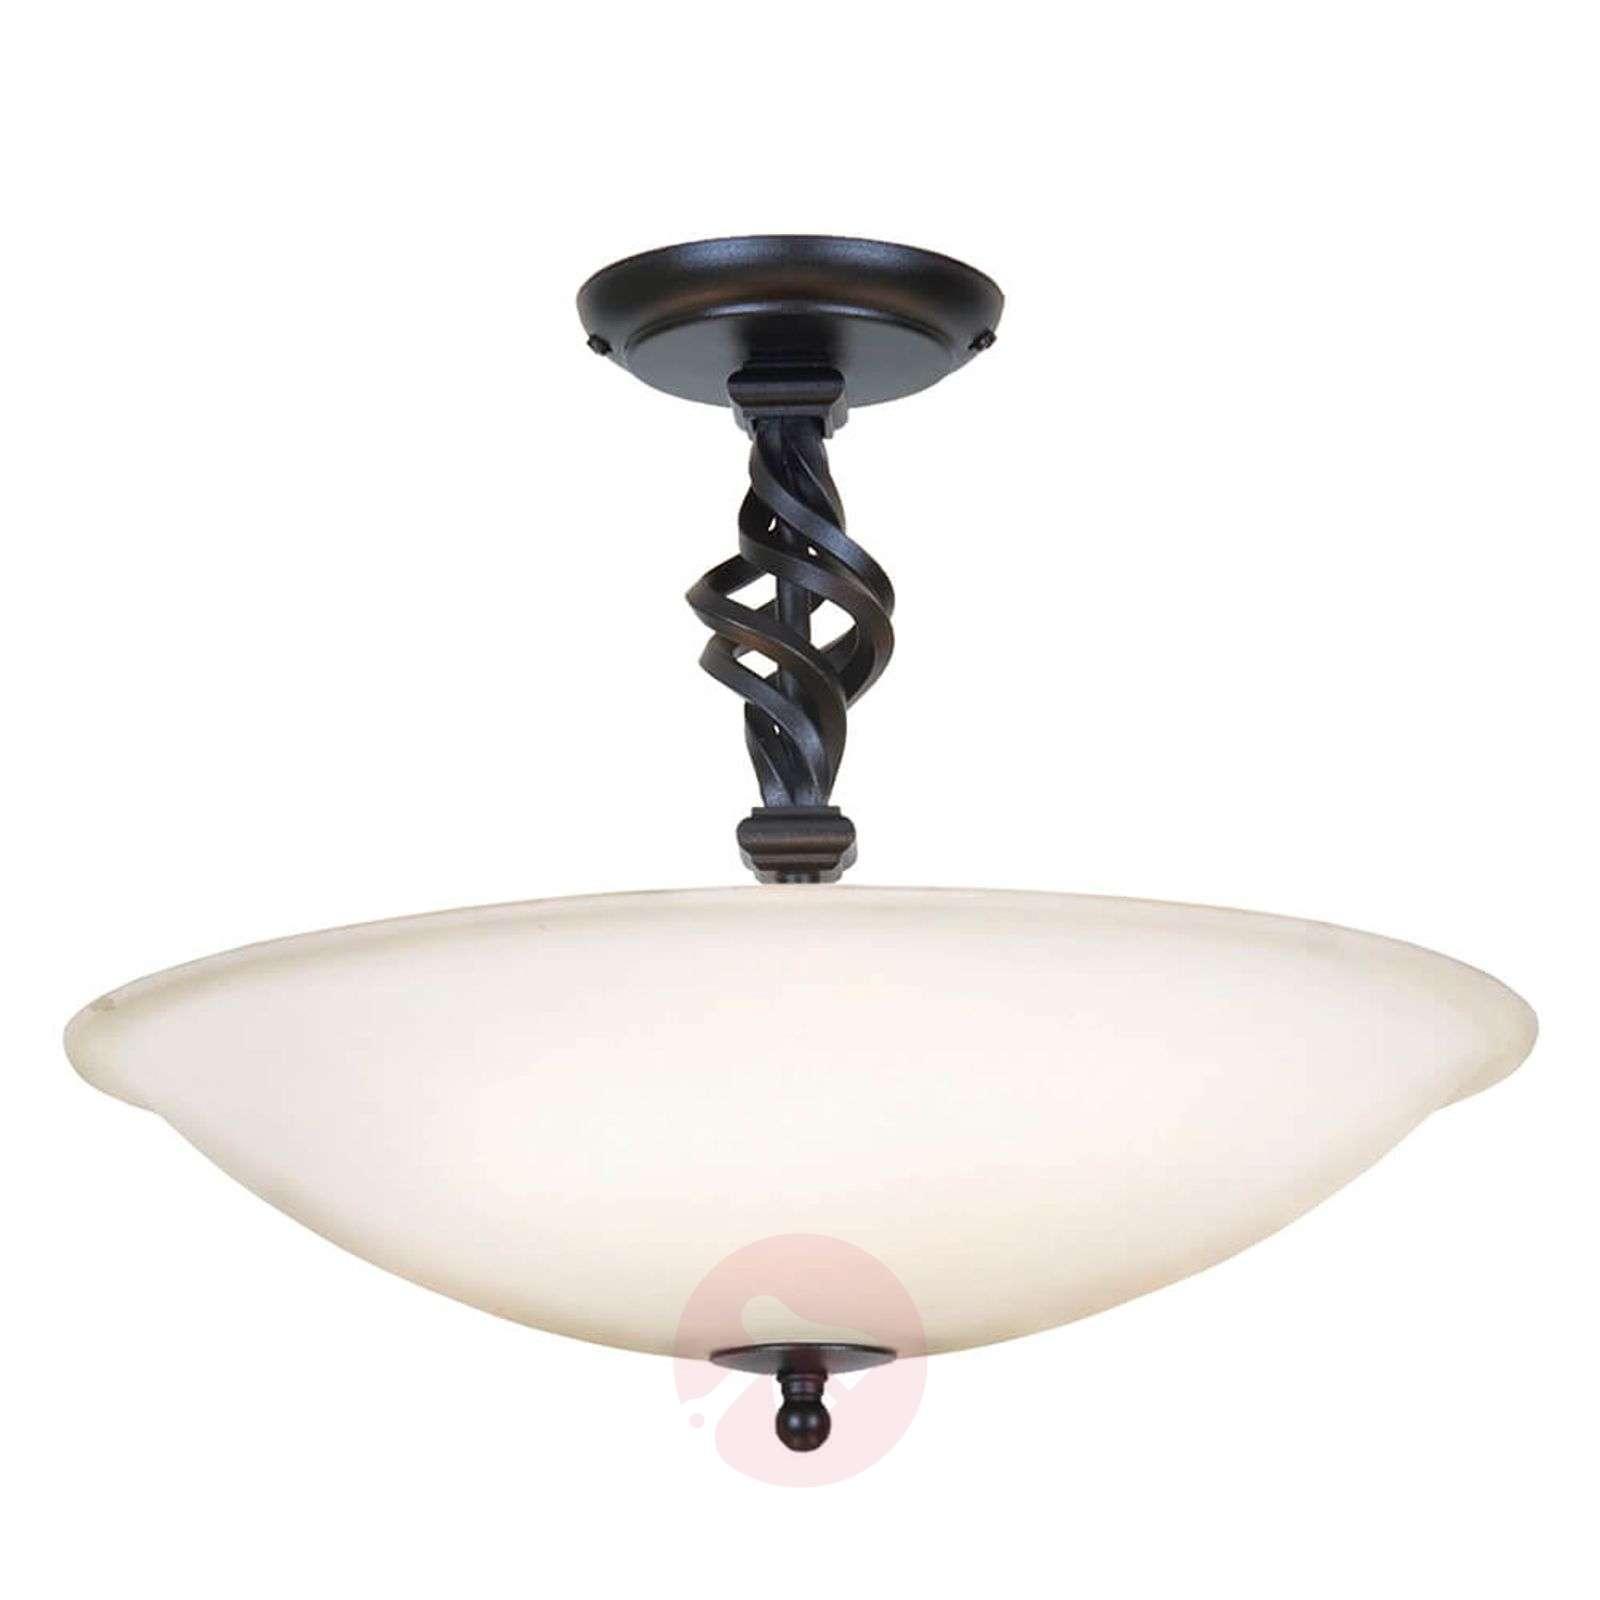 Very elegant semi-flush ceiling lamp Pembroke-3048629-01